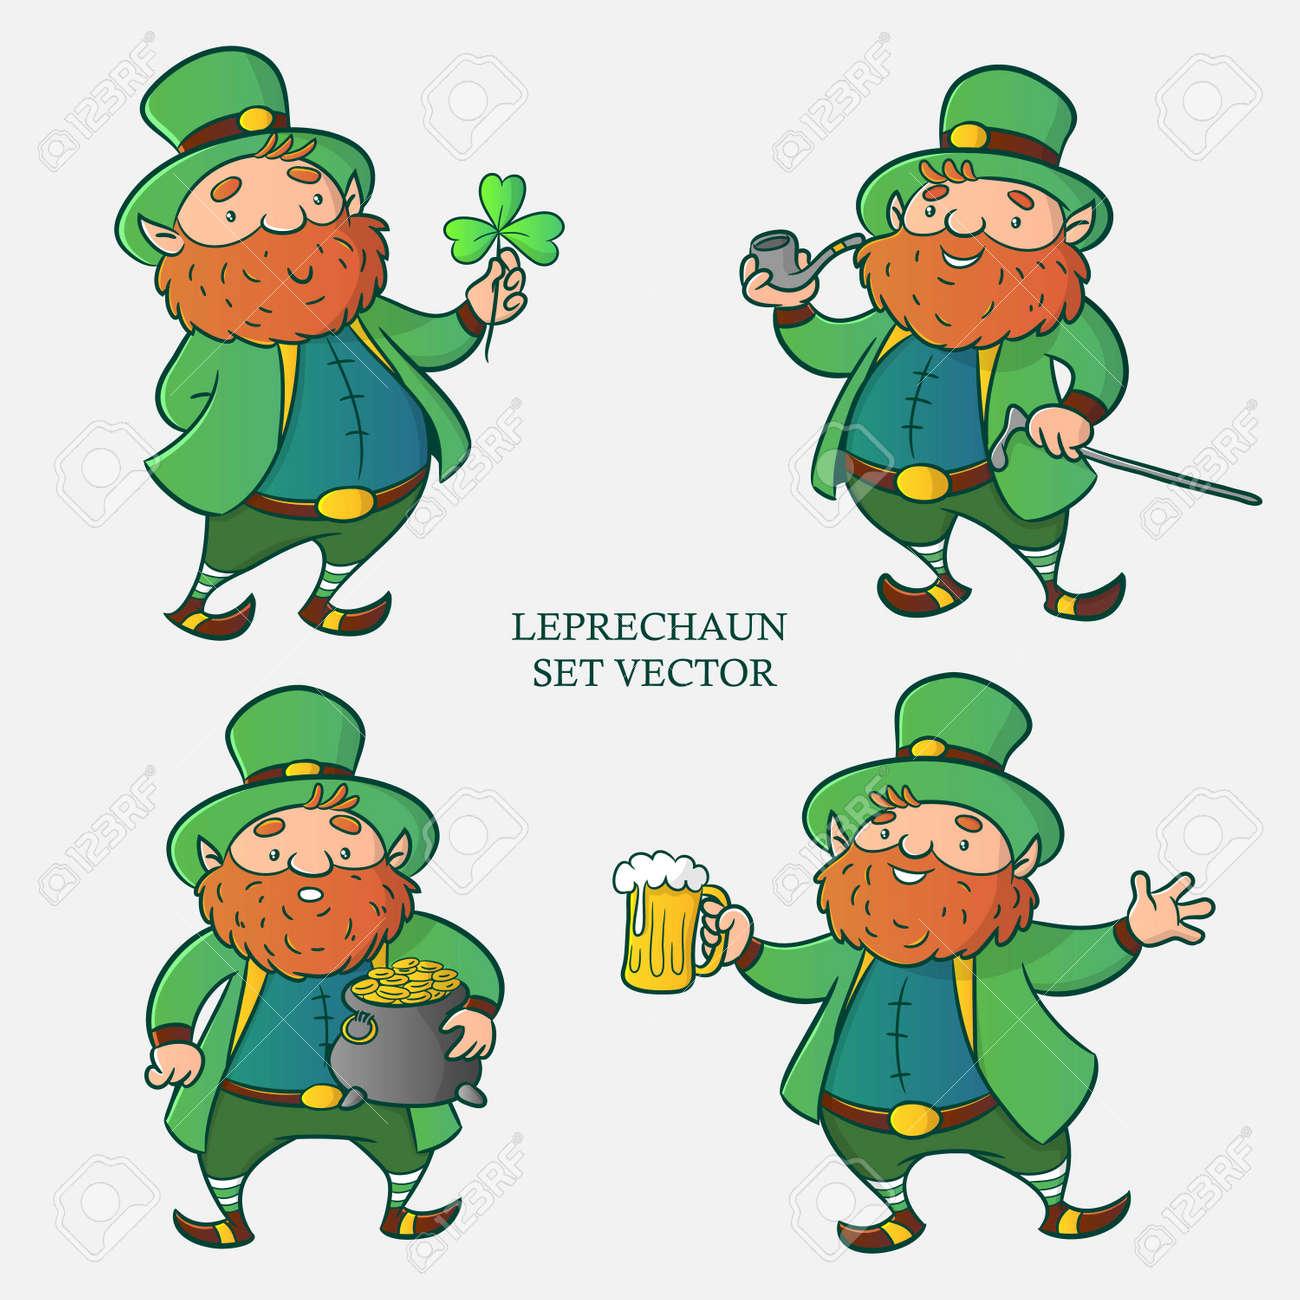 Leprechaun set vector, cartoon character, illustration for happy st patrick day - 124517710